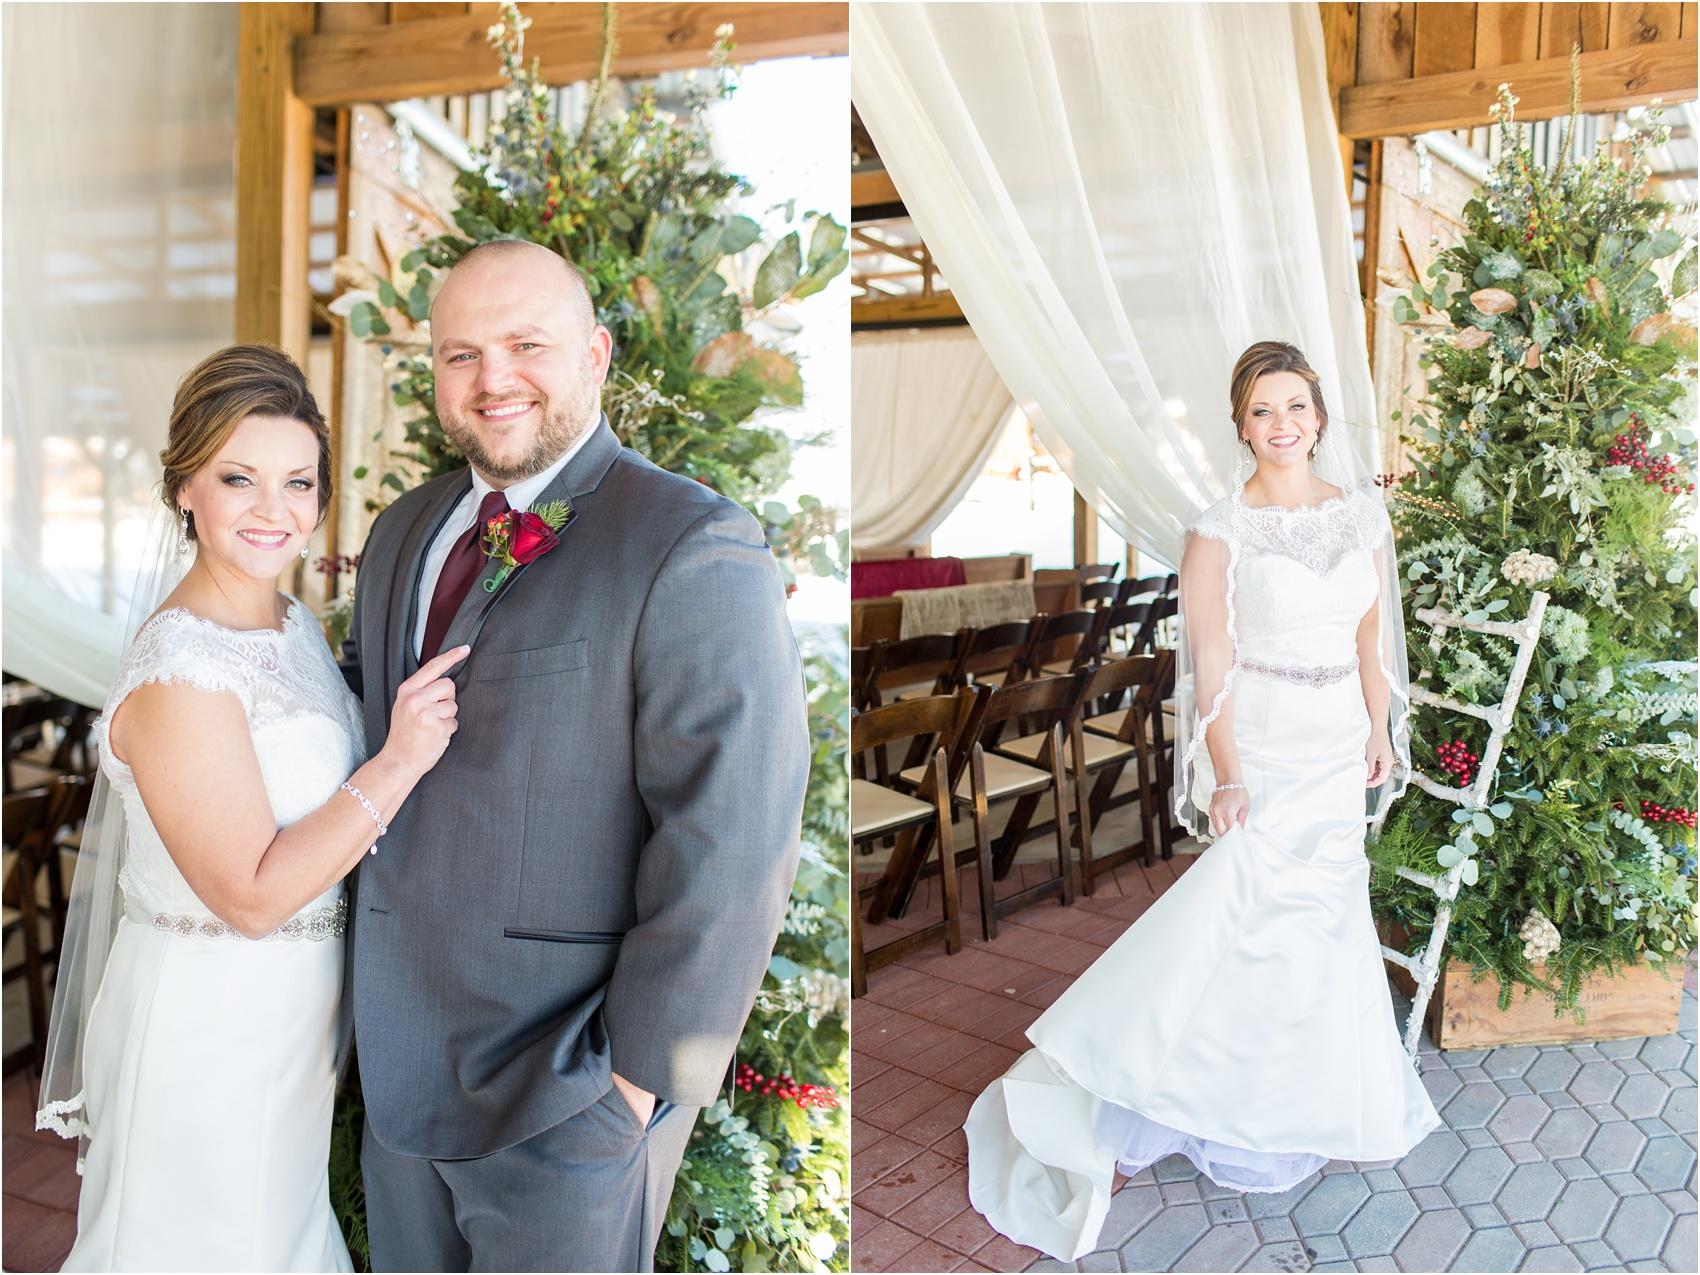 Savannah Eve Photography- Page Wedding Blog-32.jpg